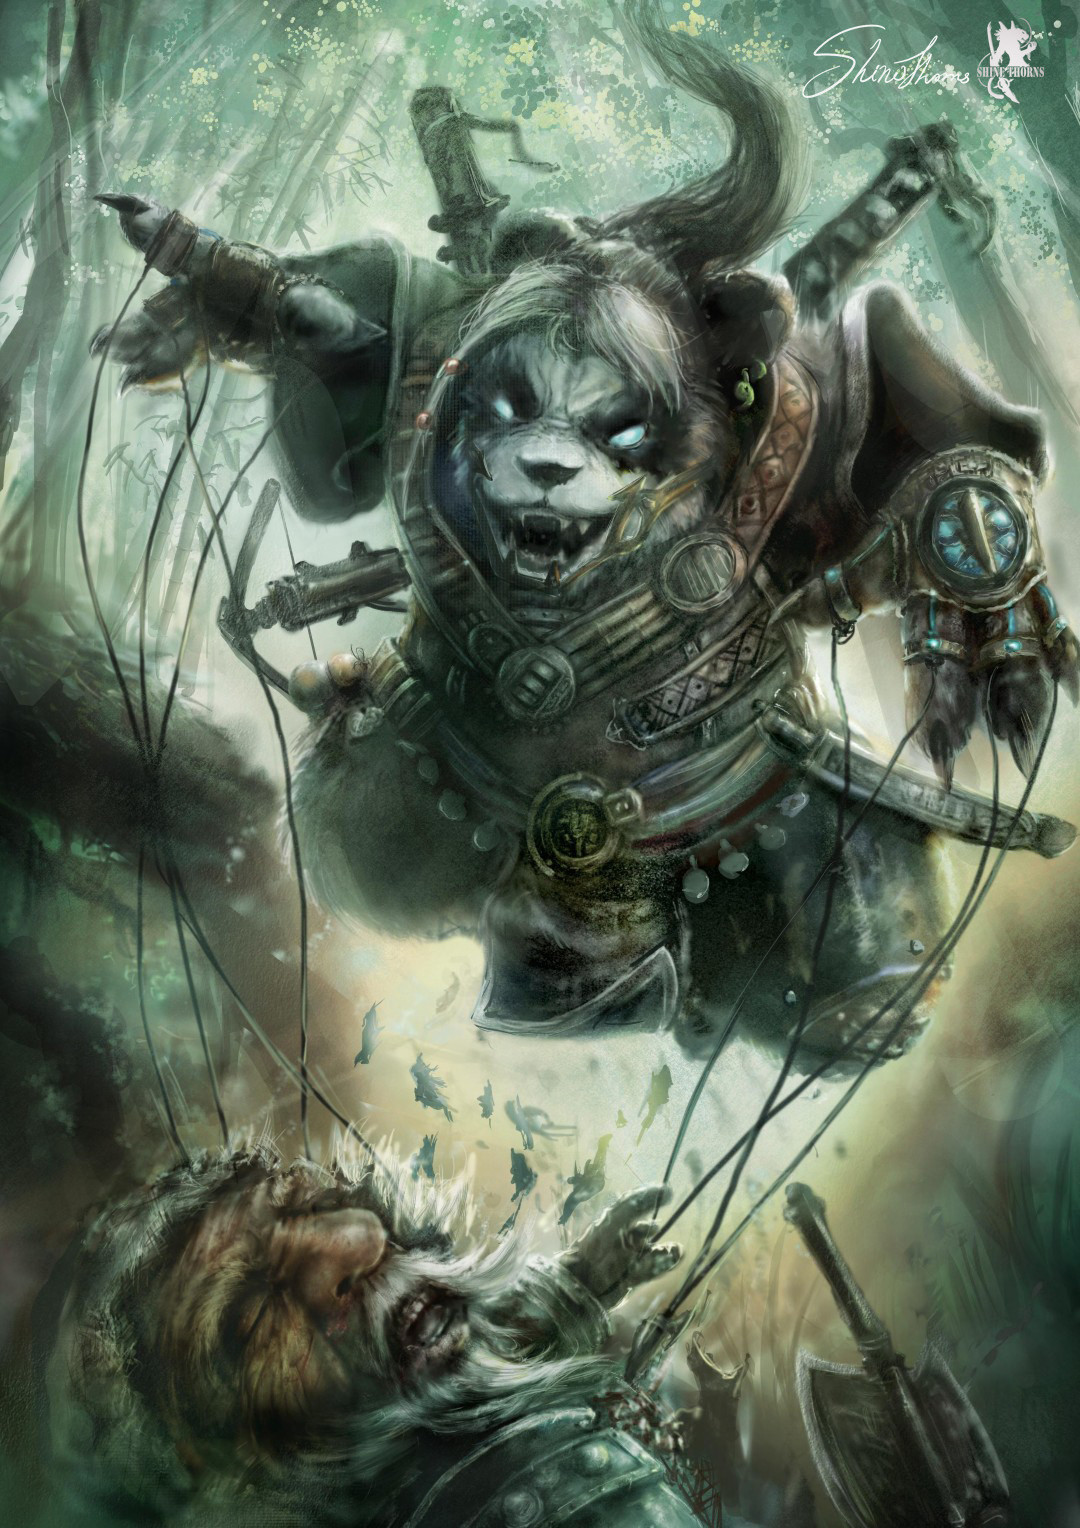 Panda Man fight with Dwarf